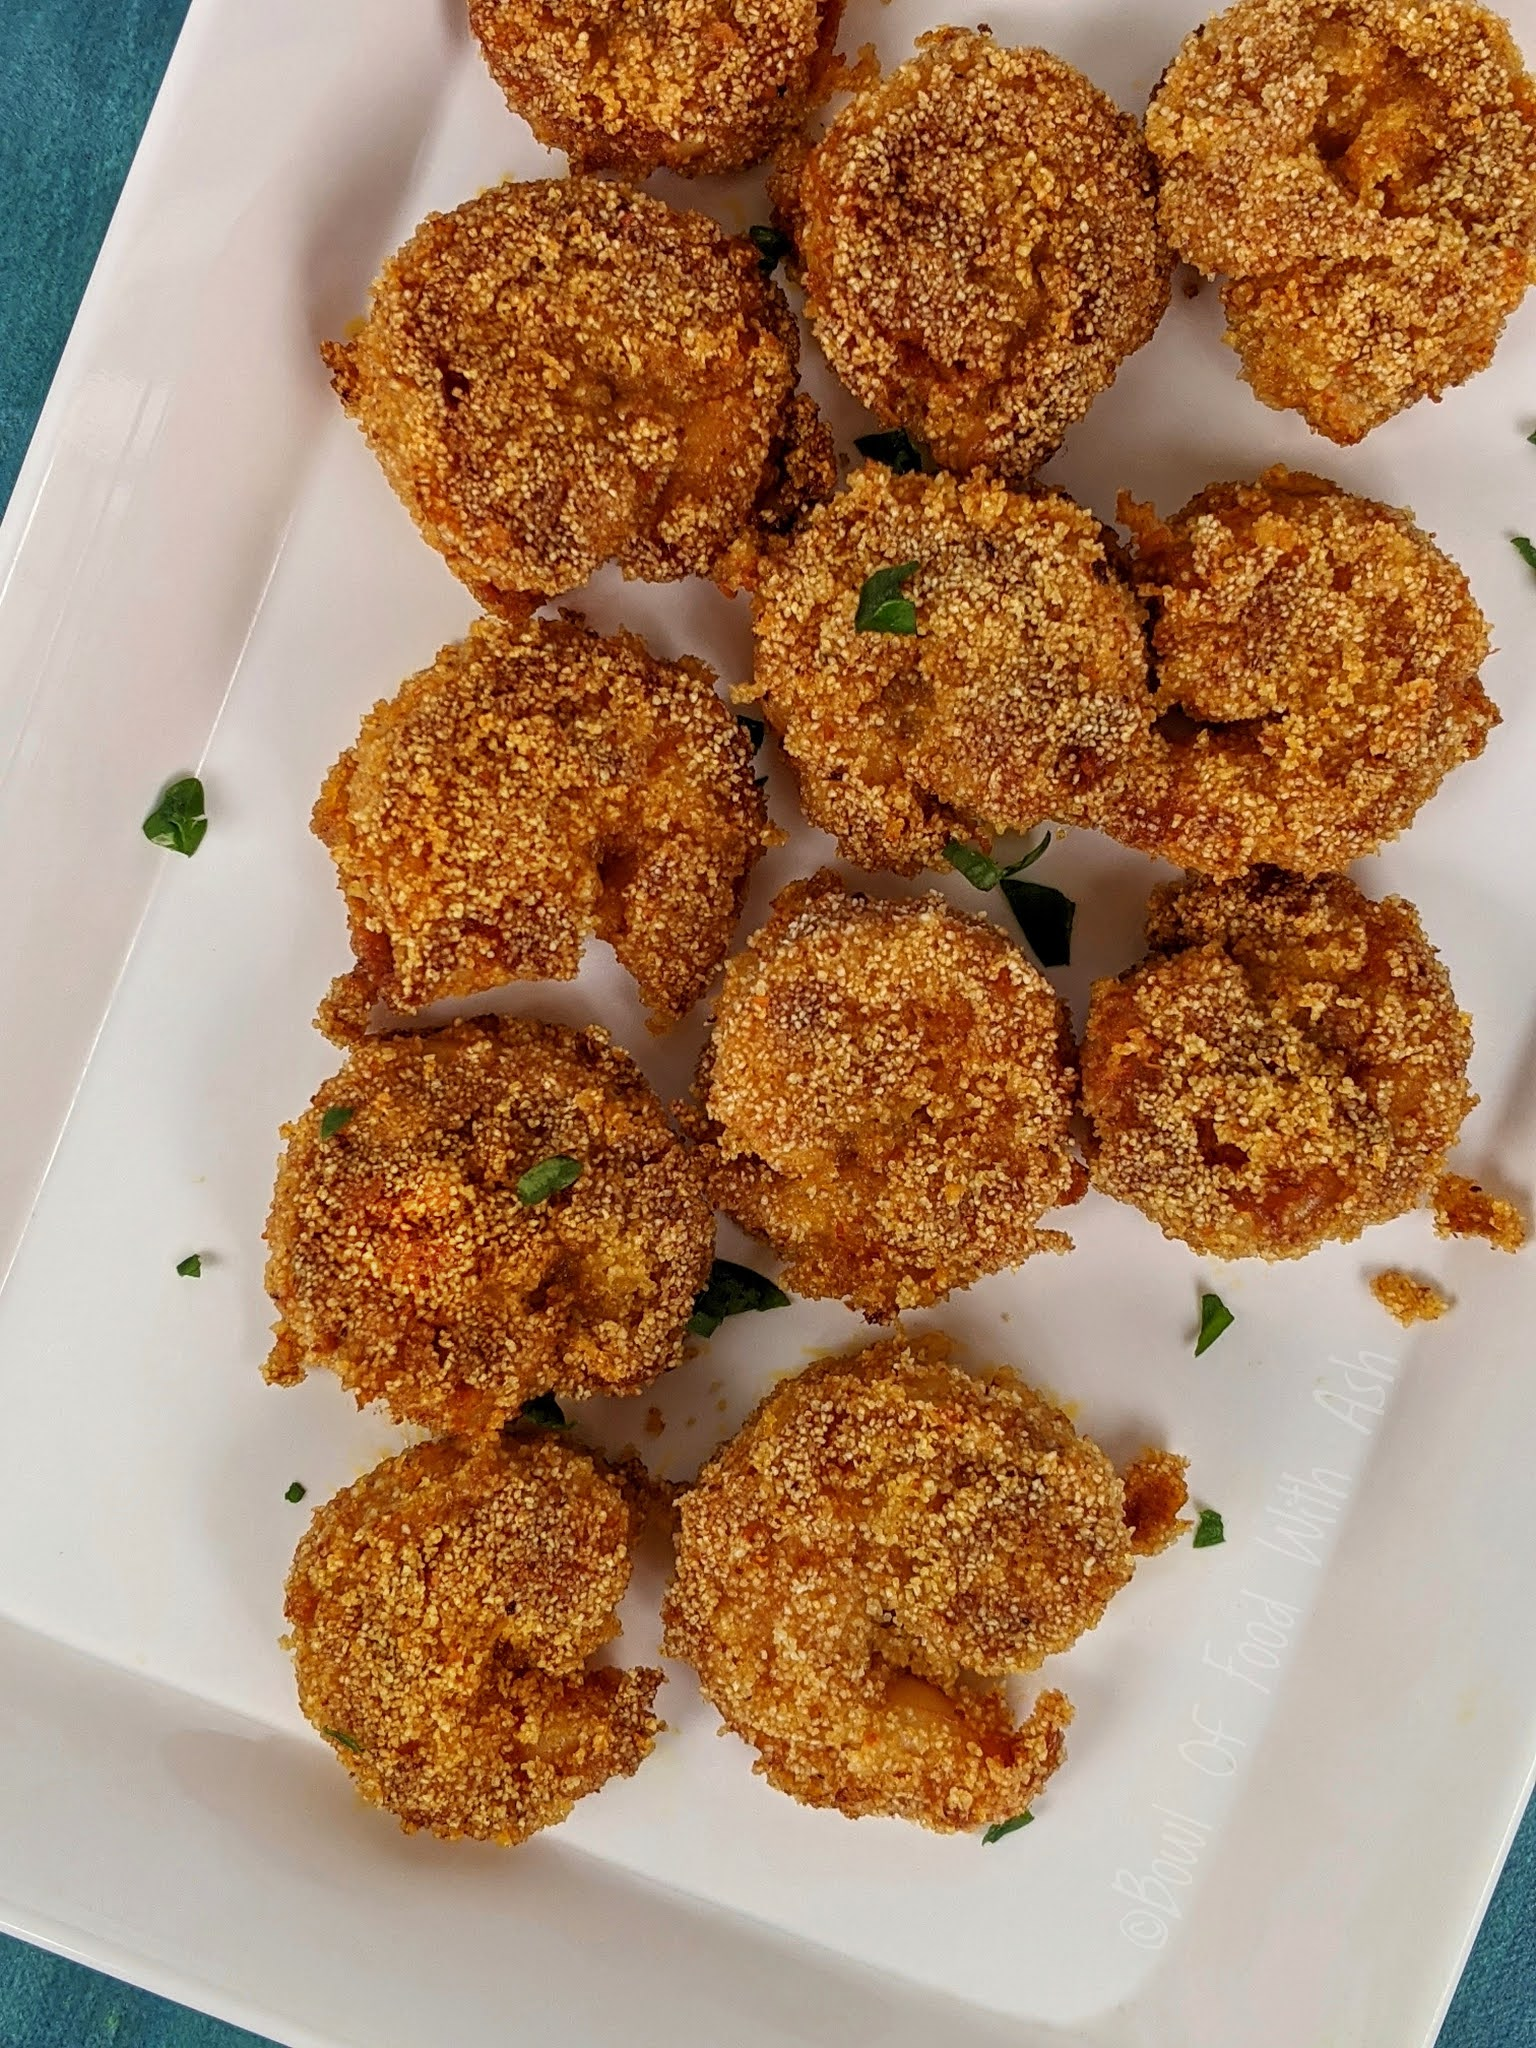 Prawns Rava Fry Recipe | How To Make Rava Fried Prawns